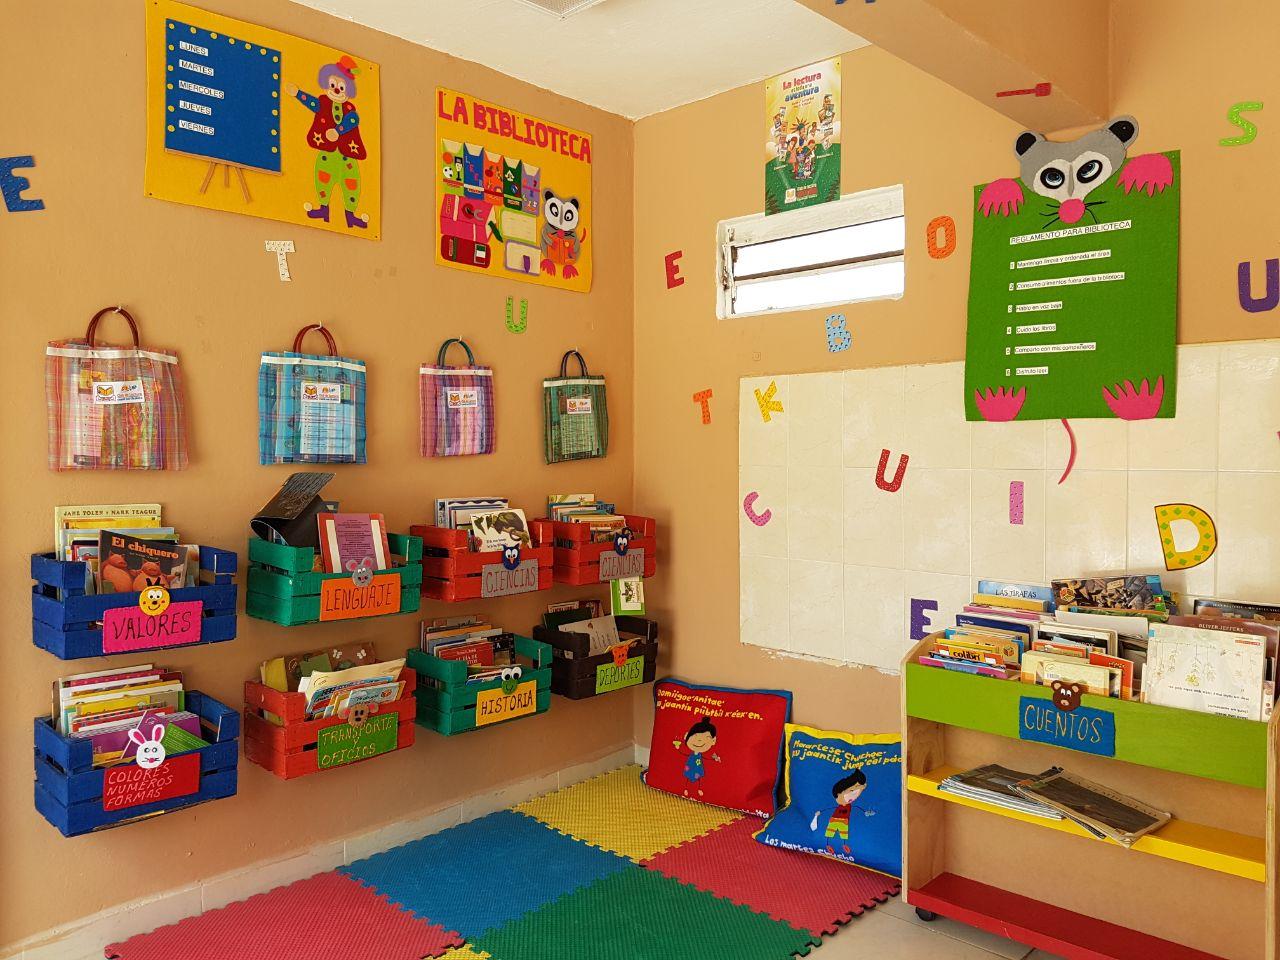 Solyluna A C Una Biblioteca En El Preescolar Popol Vuh